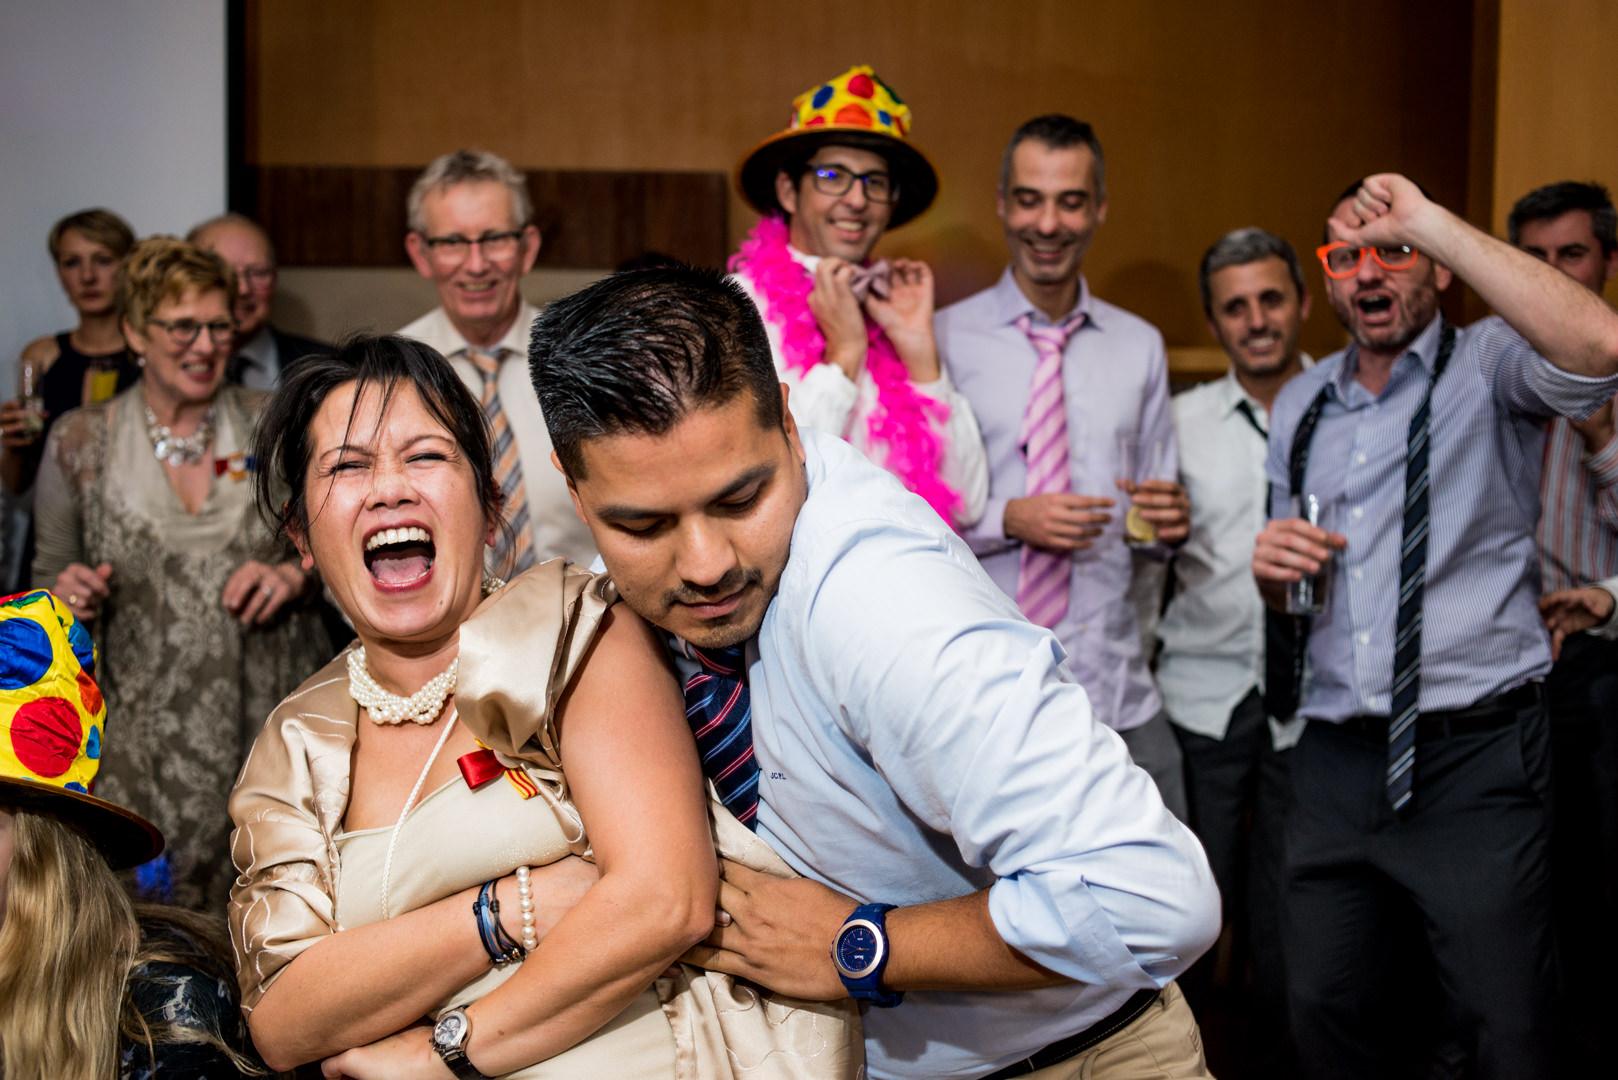 Same-sex-wedding-barcelona-boda- gay-samesex-engagement-Rafael-Torres-fotografo-bodas-sevilla-madrid-barcelona-wedding-photographer--59.jpg